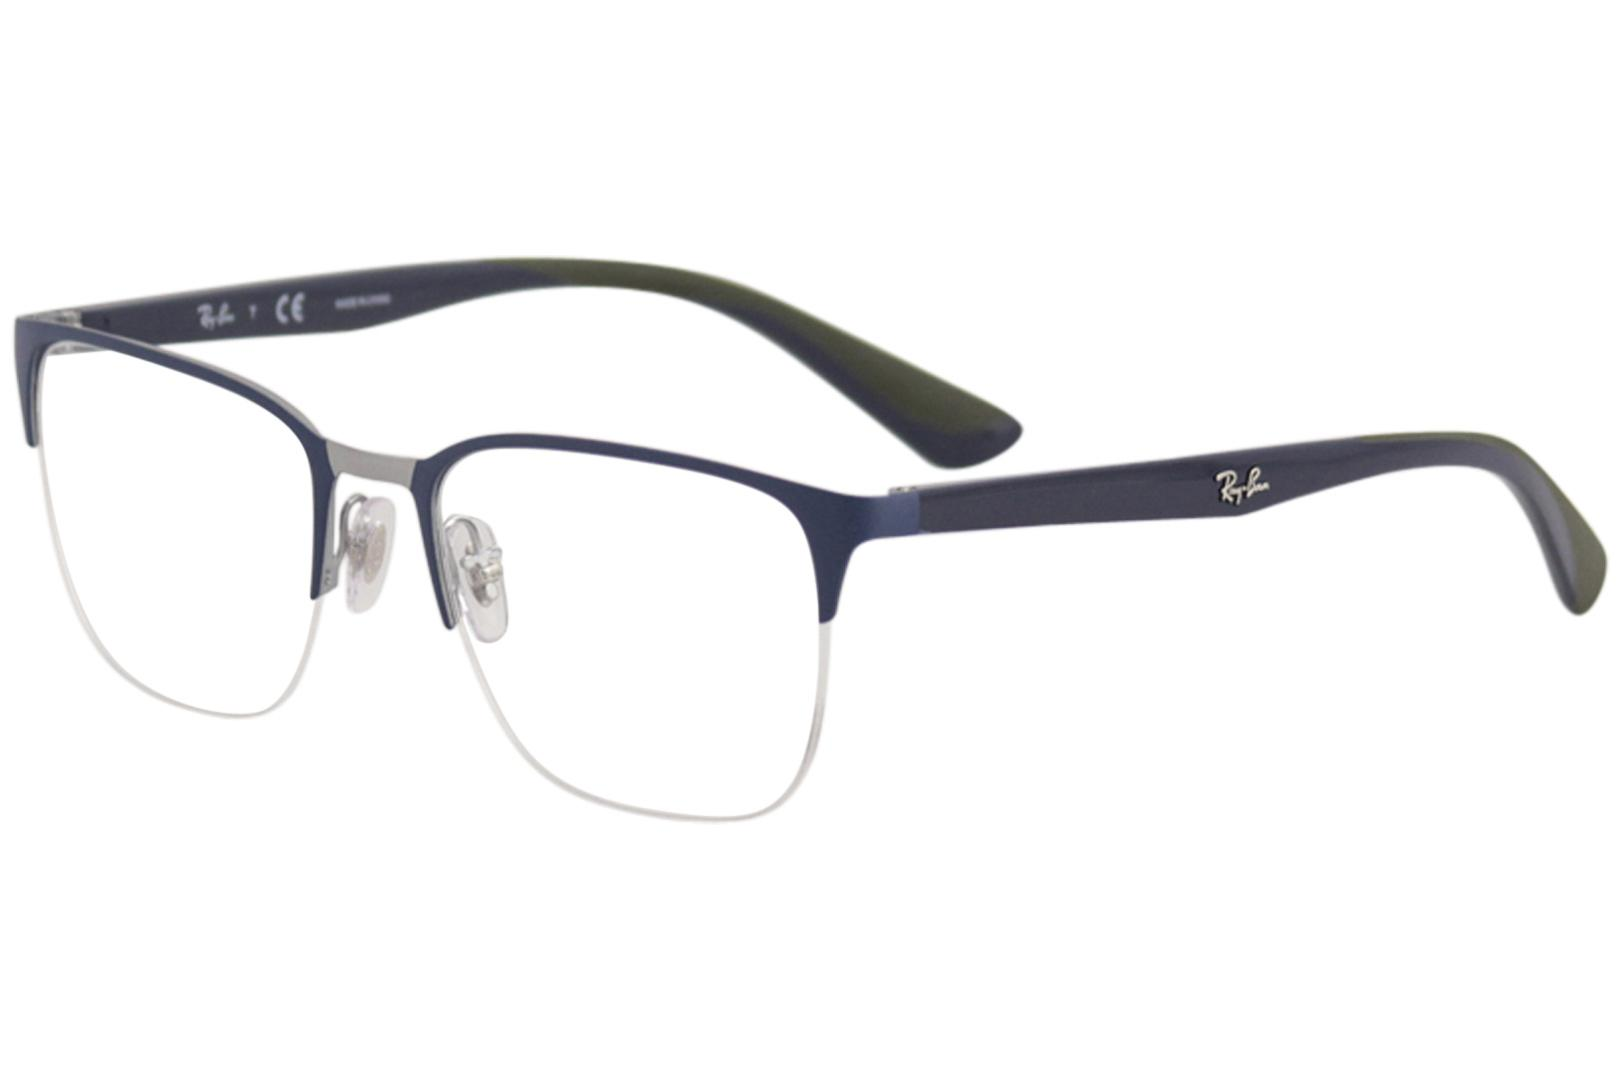 ff92c75ce58f Ray Ban Men's Eyeglasses RB6428 RX/6428 Half Rim Optical Frame by Ray Ban